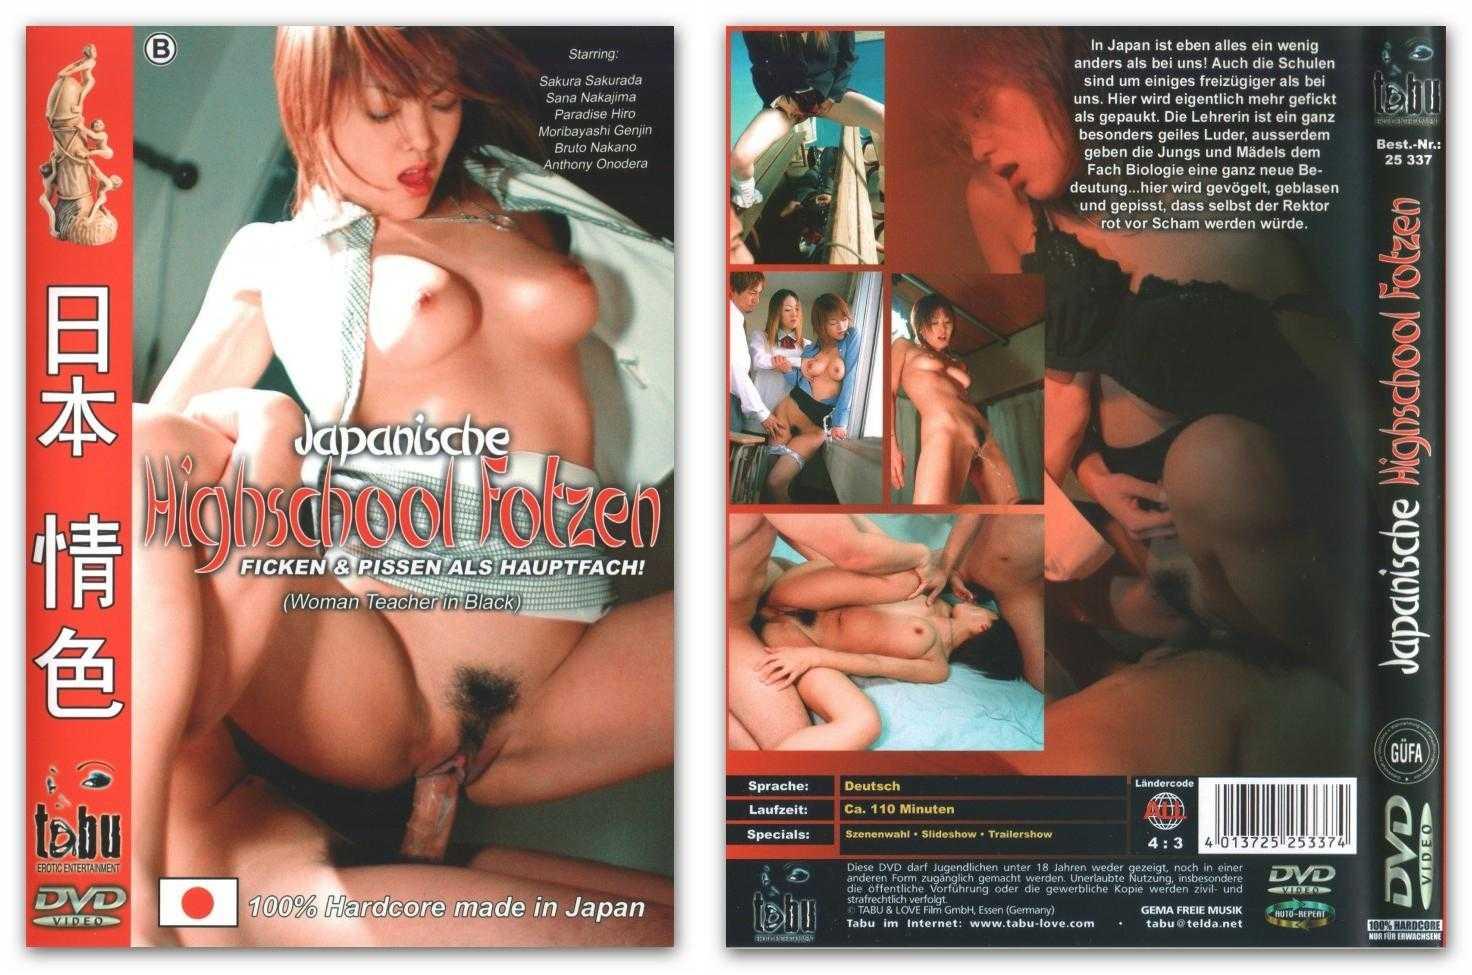 Japanische lesben - 15591 Videos - iWank TV